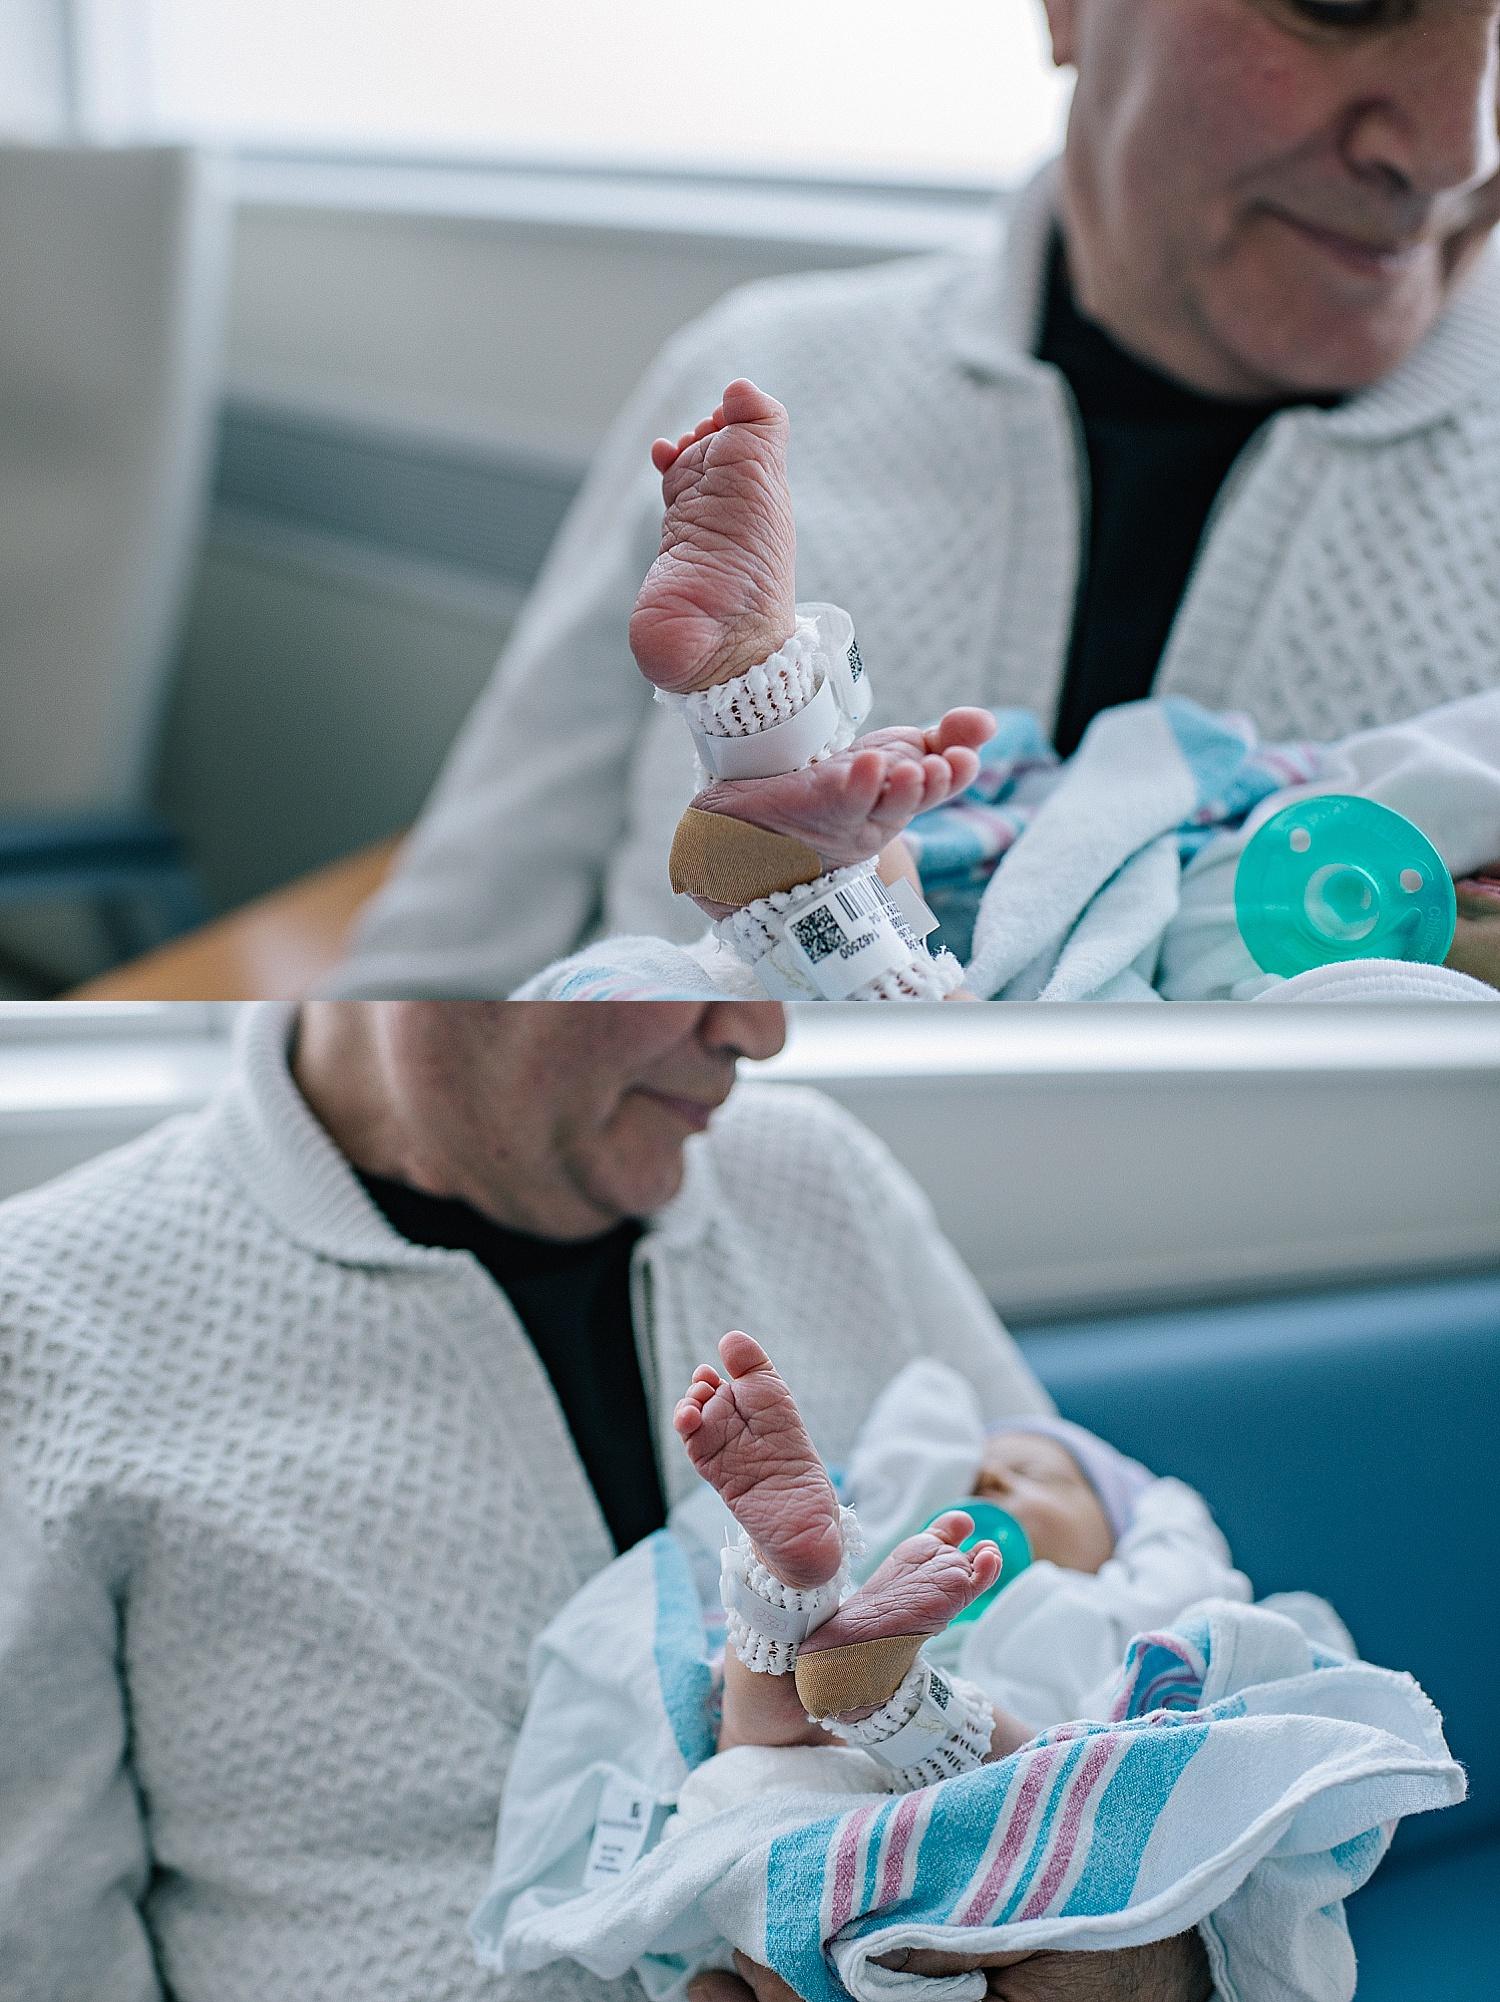 baby-toes-feet-newborn-fresh-48-birth-photographer-cleveland-akron-ohio-lauren-grayson